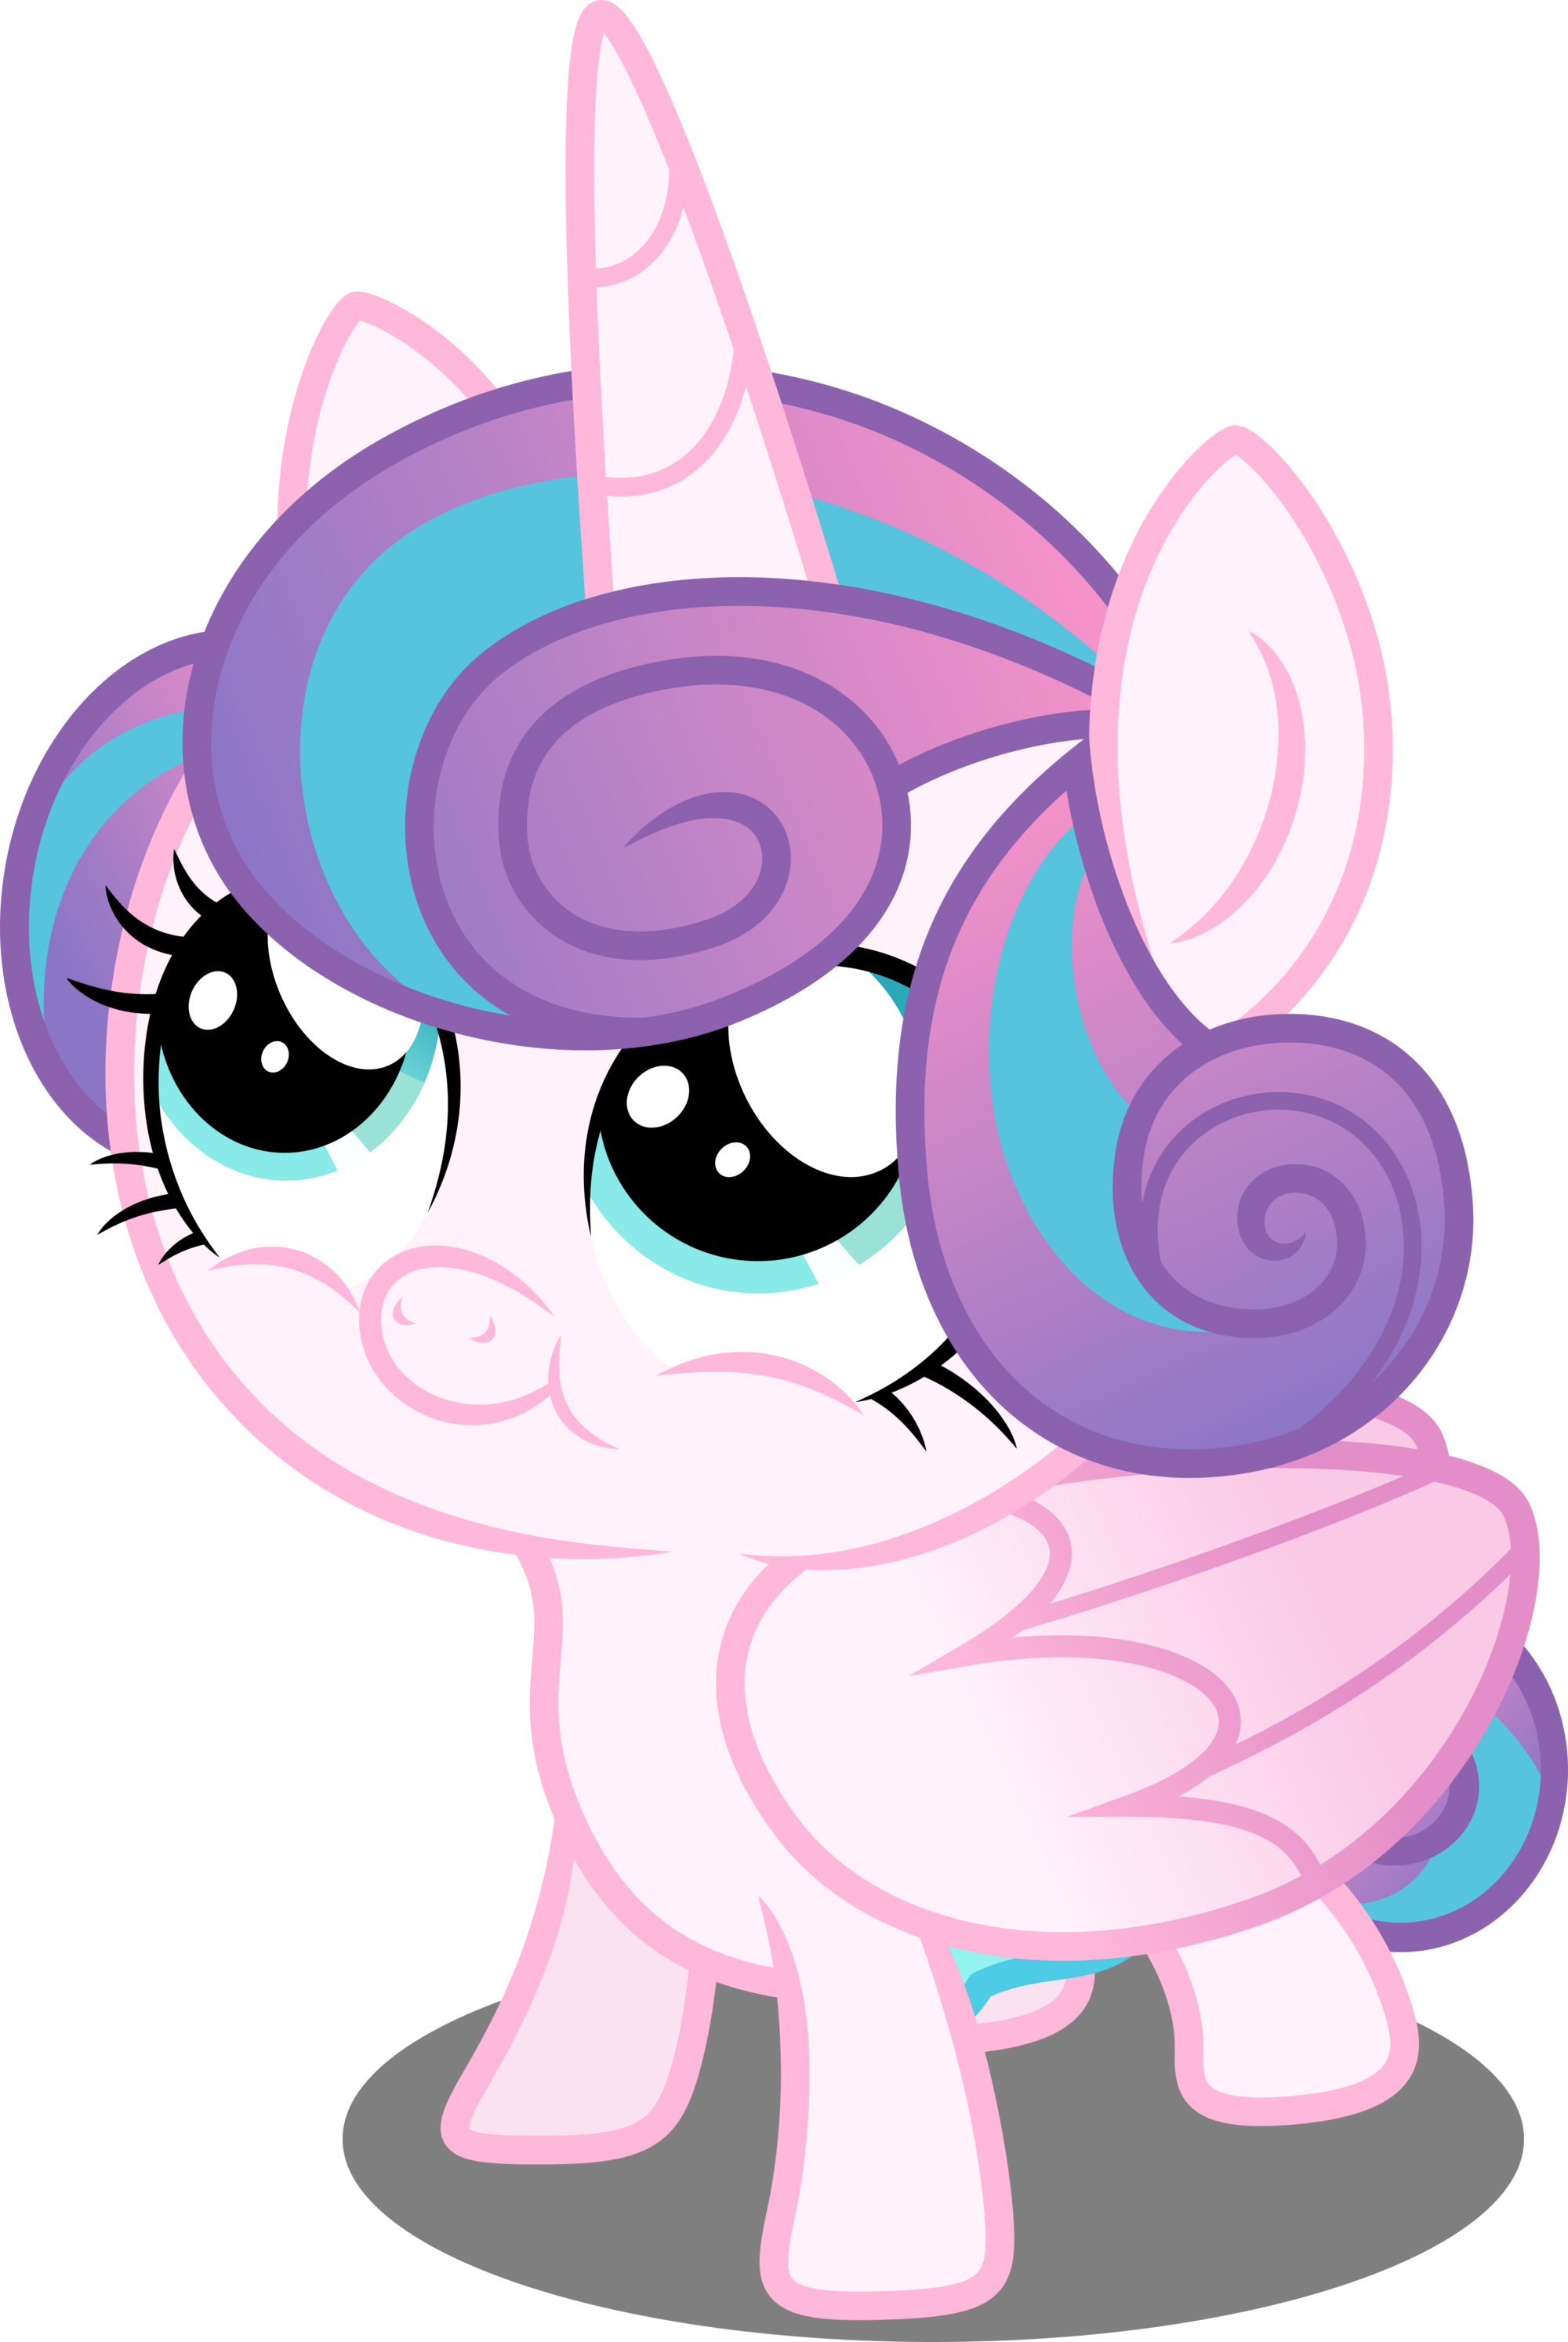 Big Mac (My Little Pony) | All Worlds Alliance Wiki | Fandom